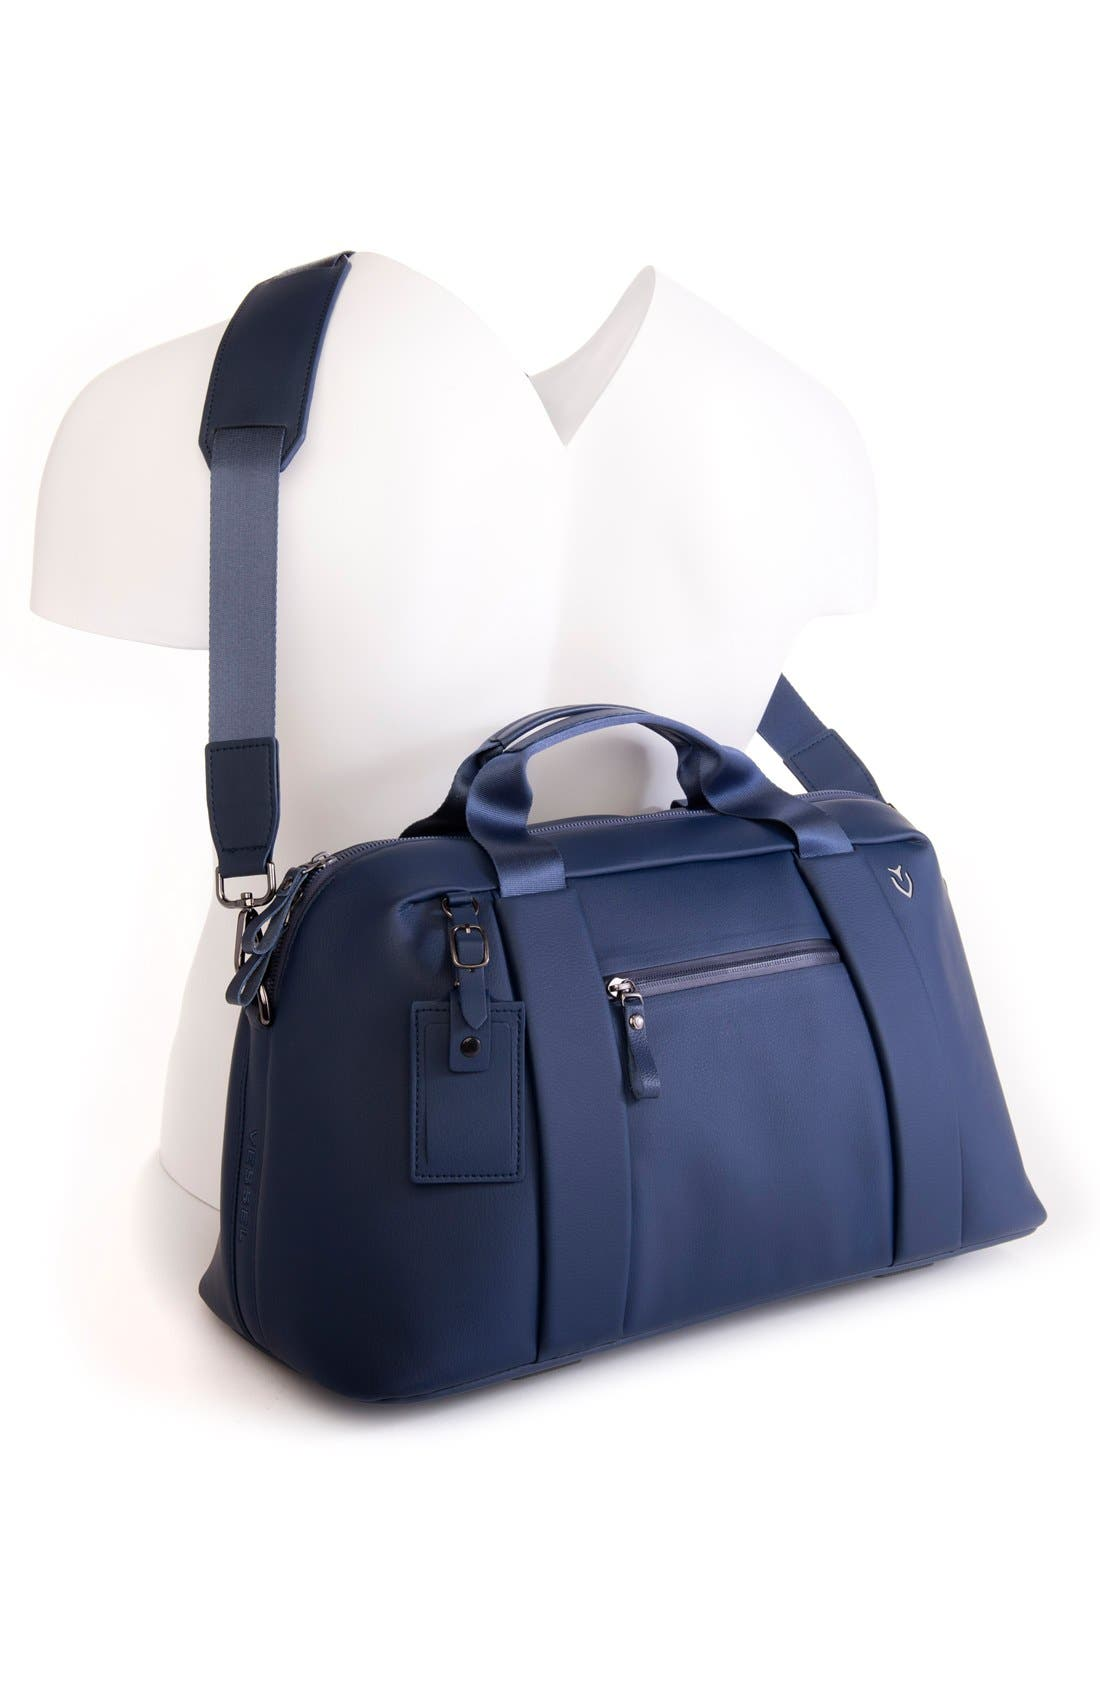 VESSEL,                             'Signature' Medium Duffel Bag,                             Alternate thumbnail 2, color,                             400